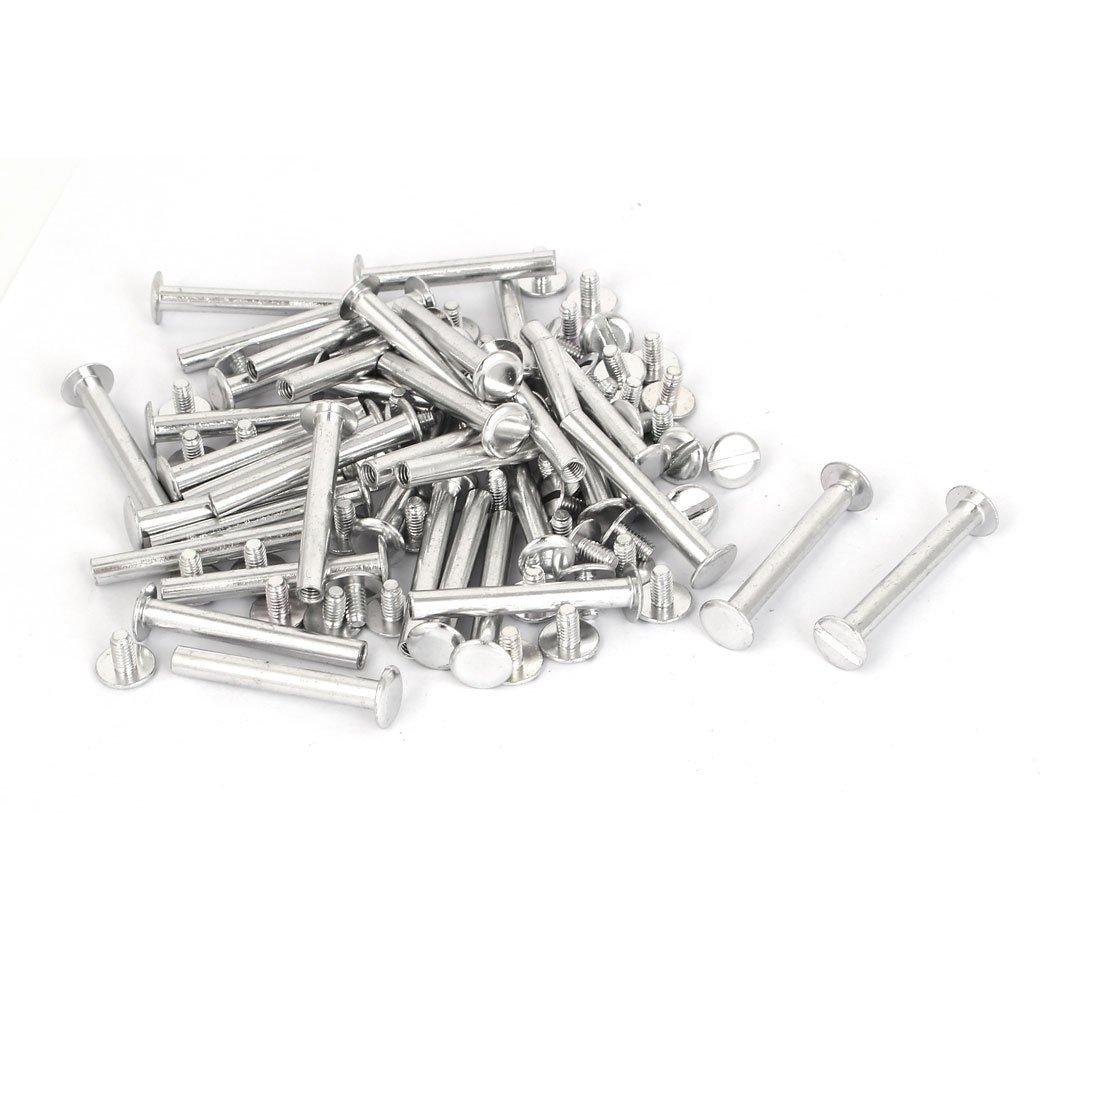 uxcell M5x38mm Aluminum Chicago Screws Binding Posts Silver Tone 50pcs